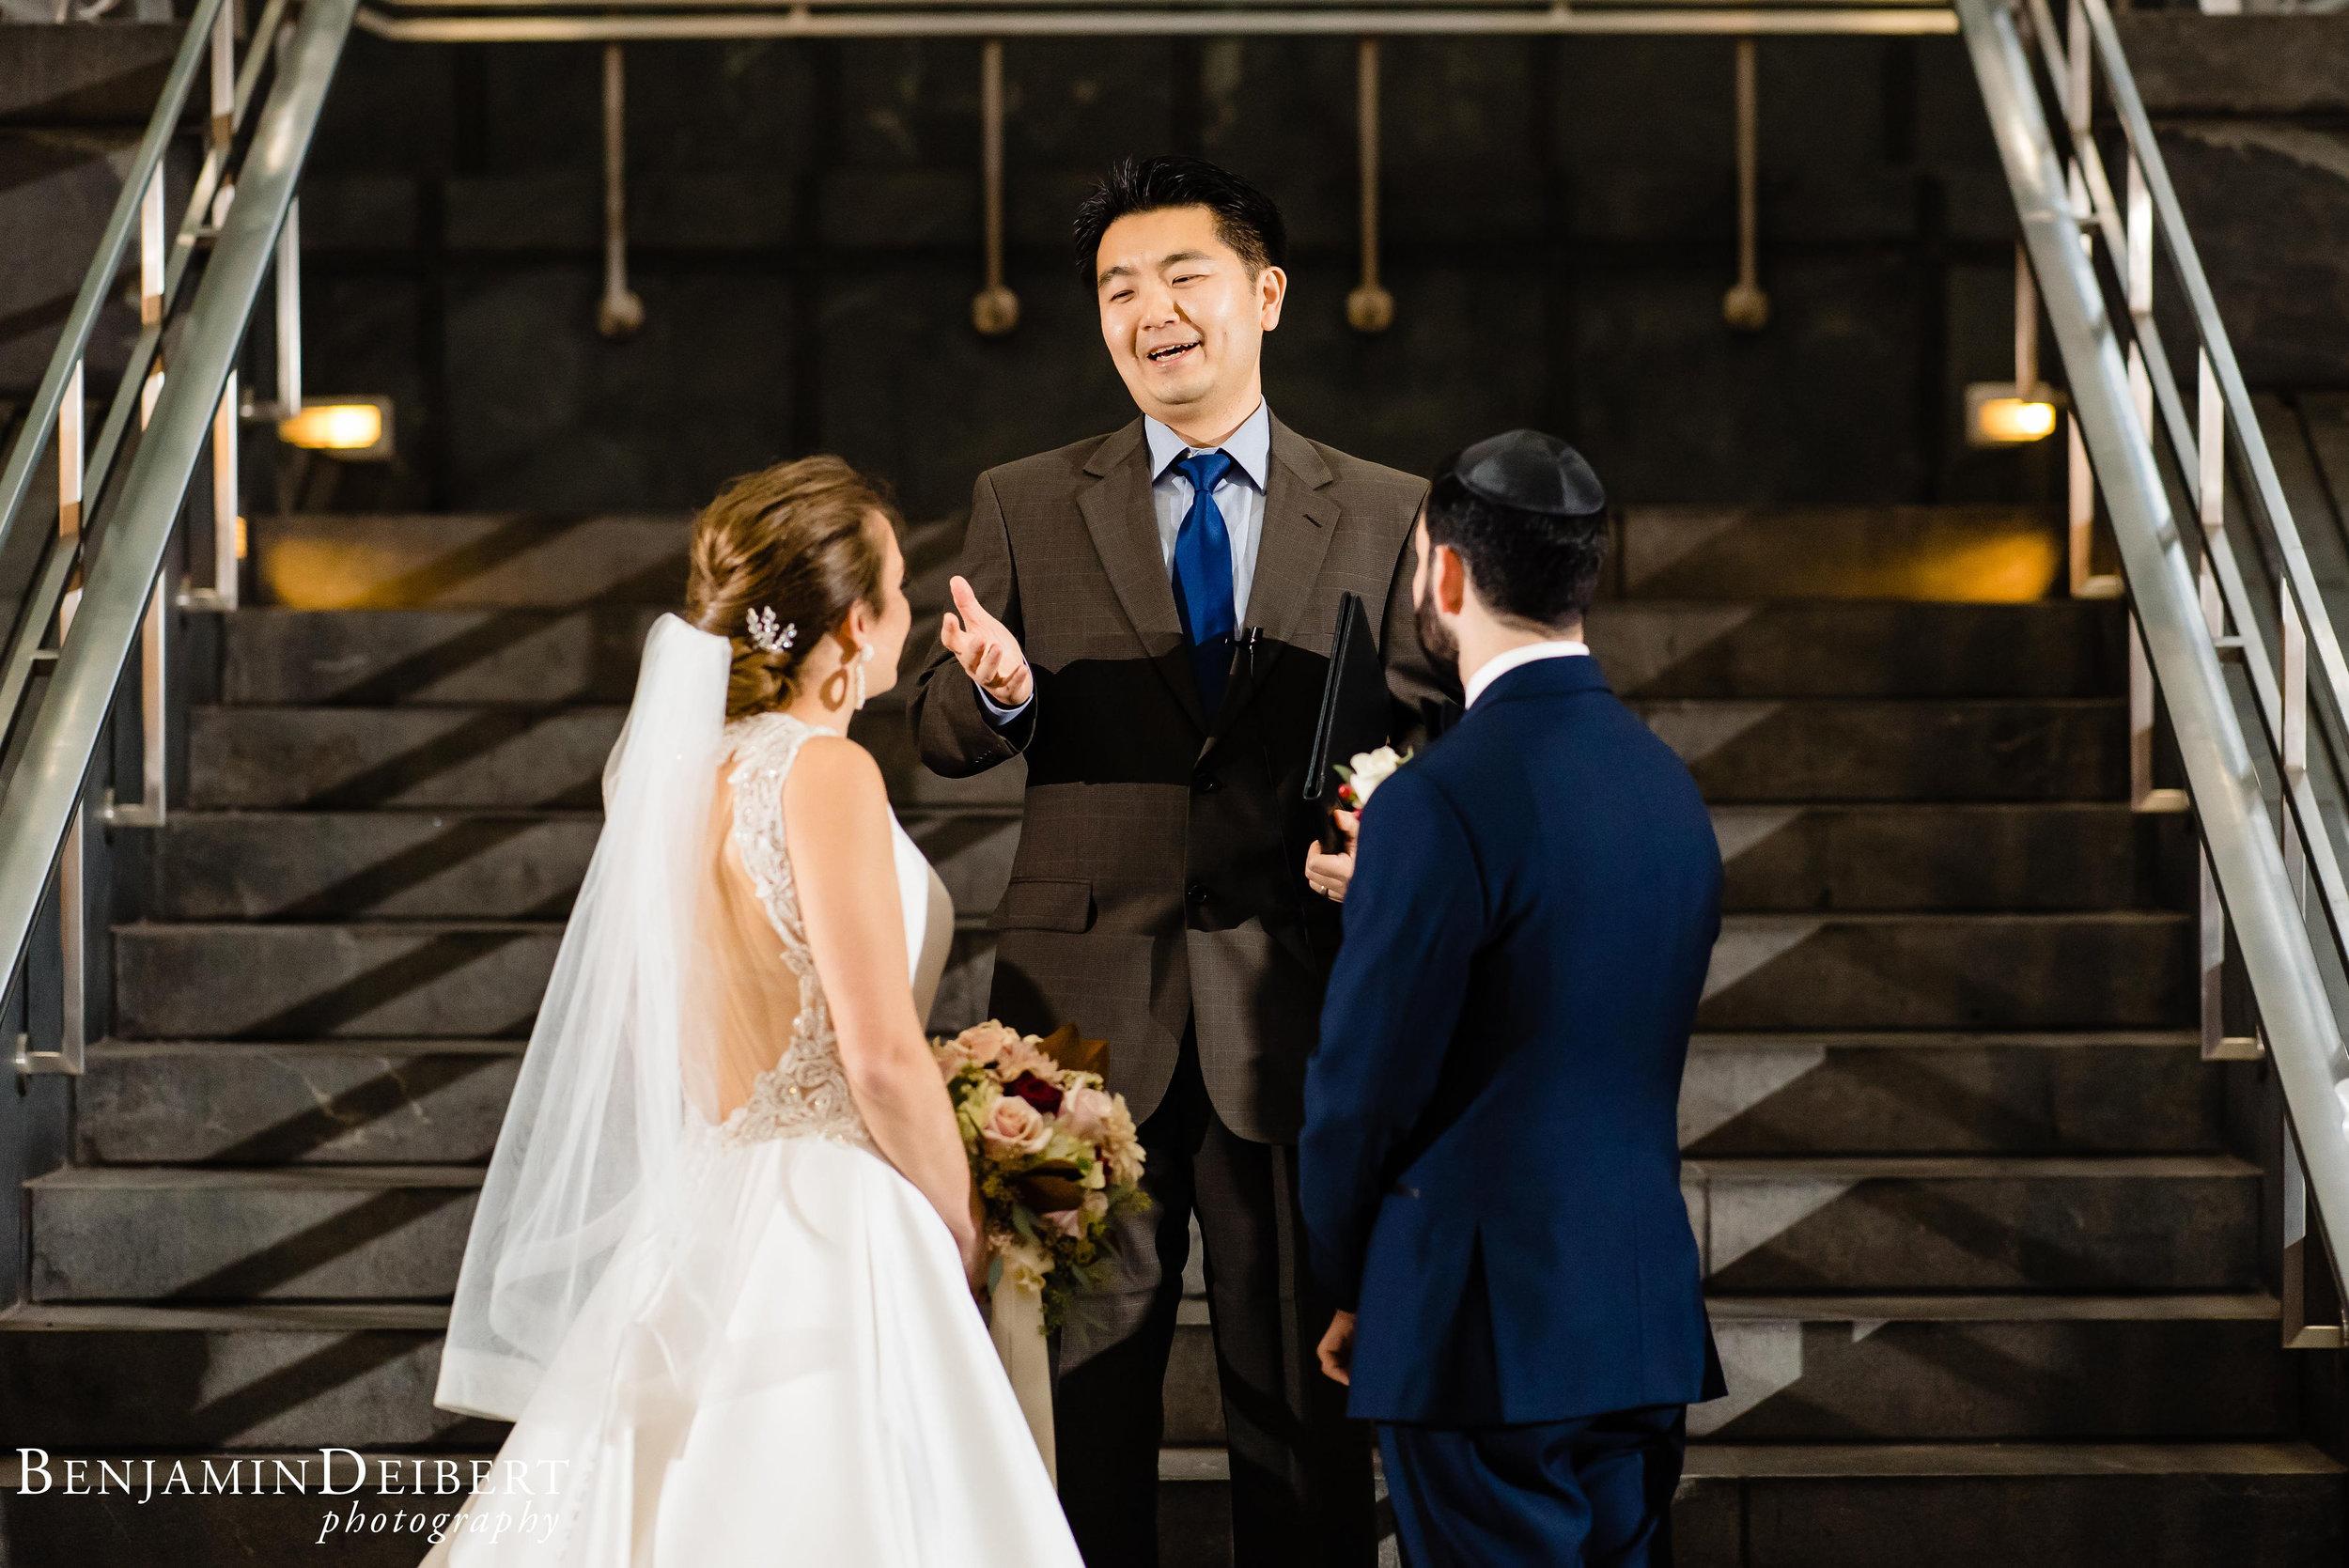 CatherineandDaniel_ThePyramidClub_Wedding-50.jpg